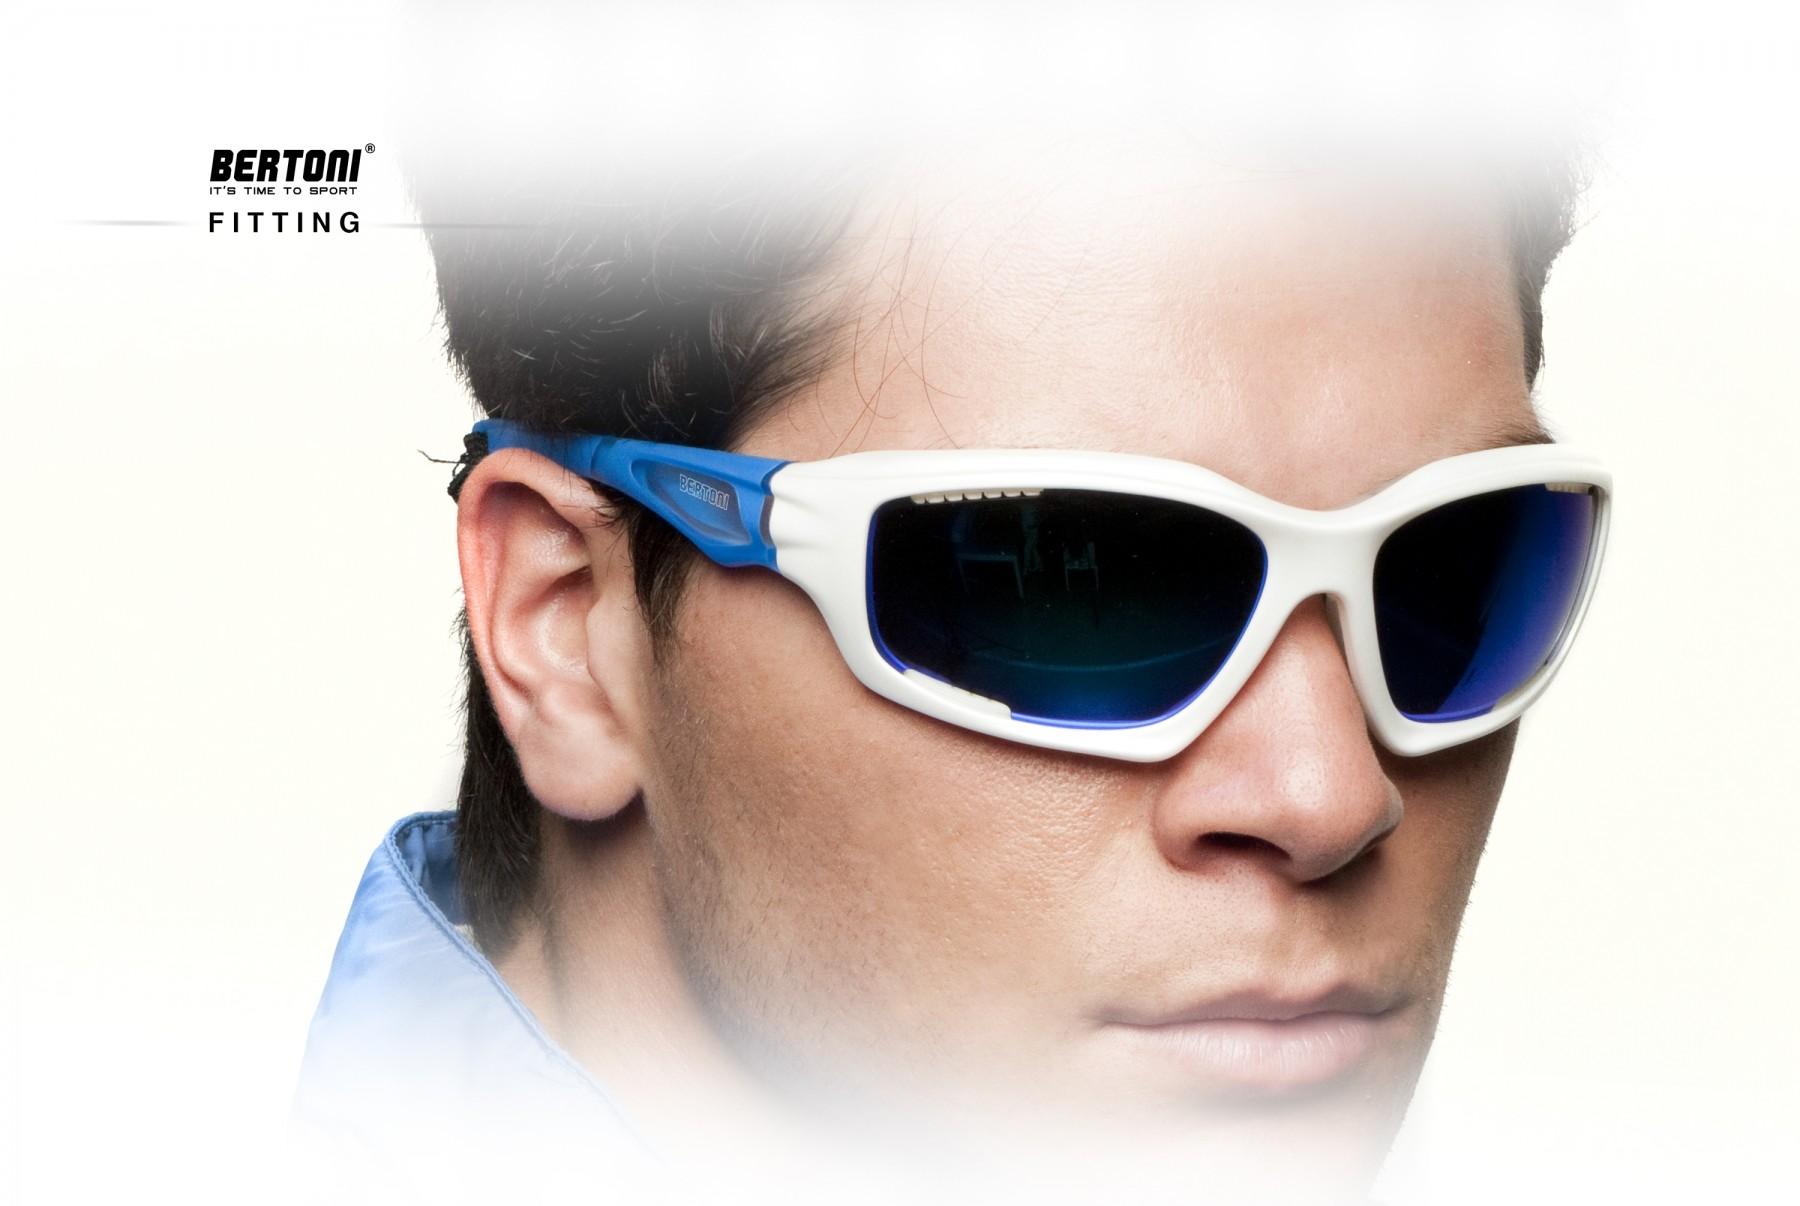 cfda734917a92 More Views. Polarized Antiglare Sunglasses for Cycling ...